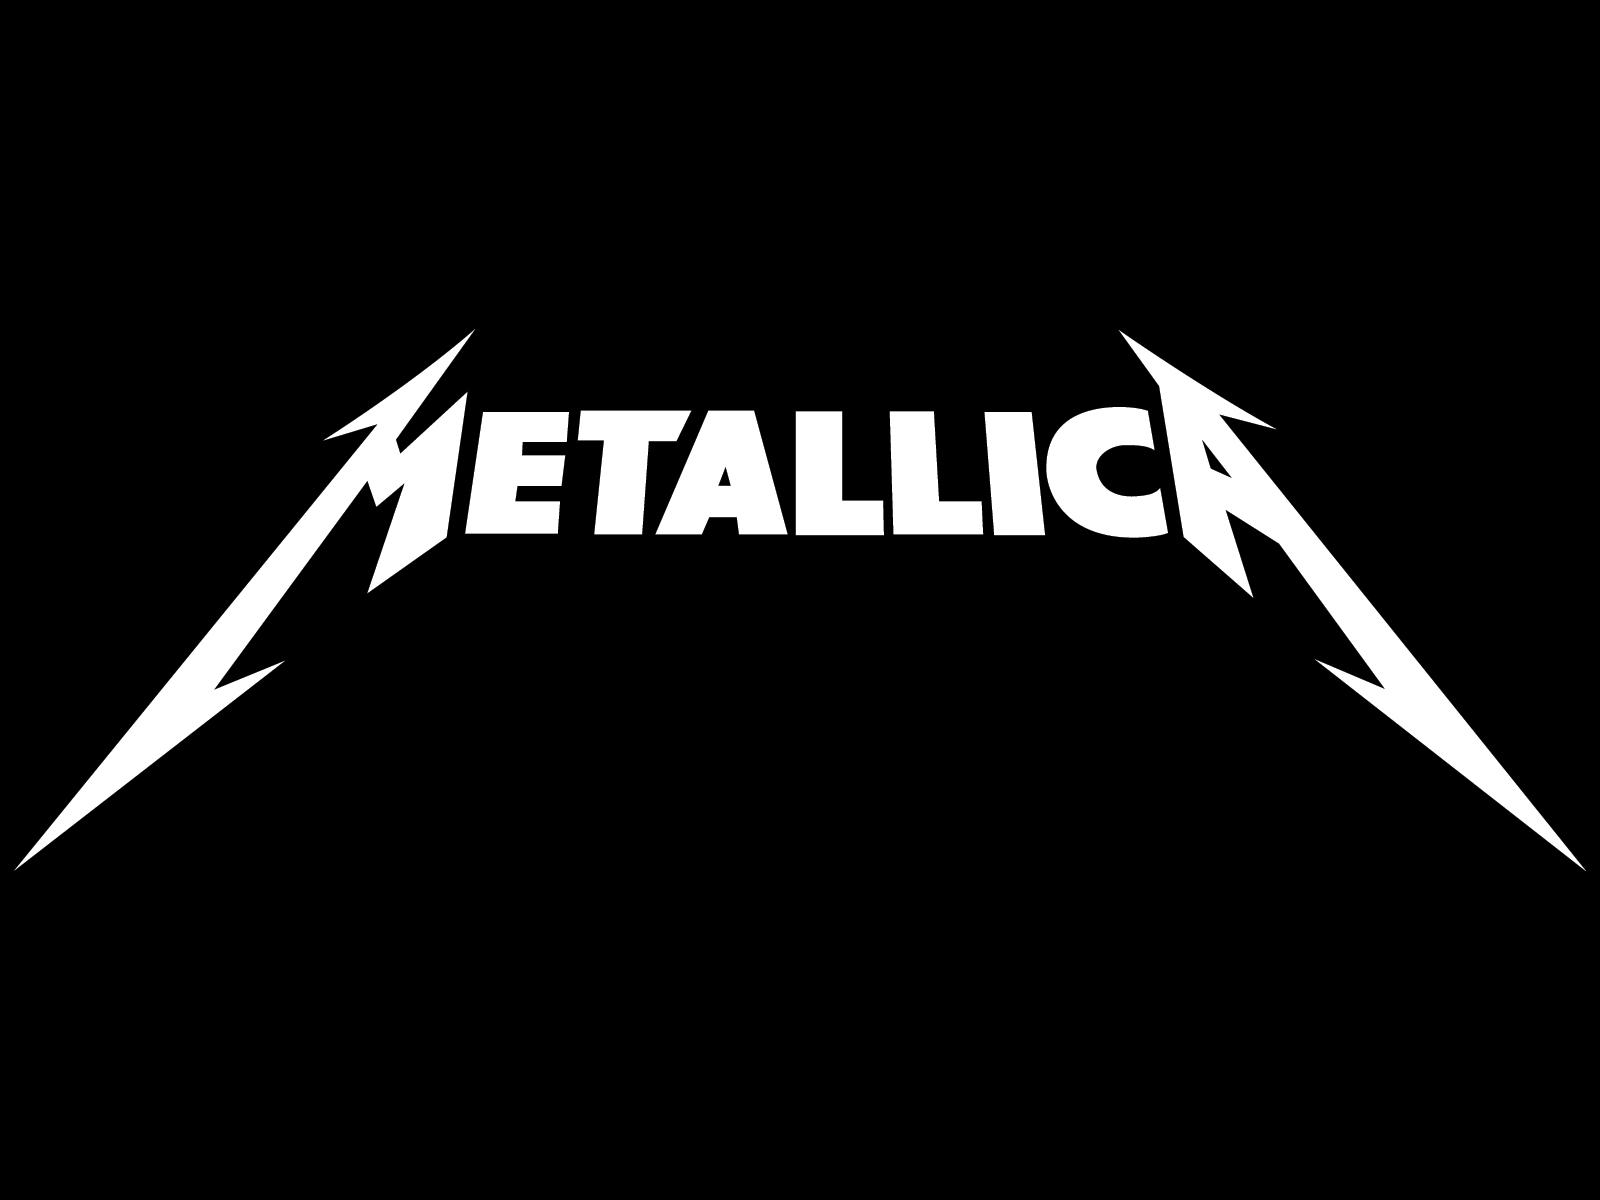 Metallica海报图片